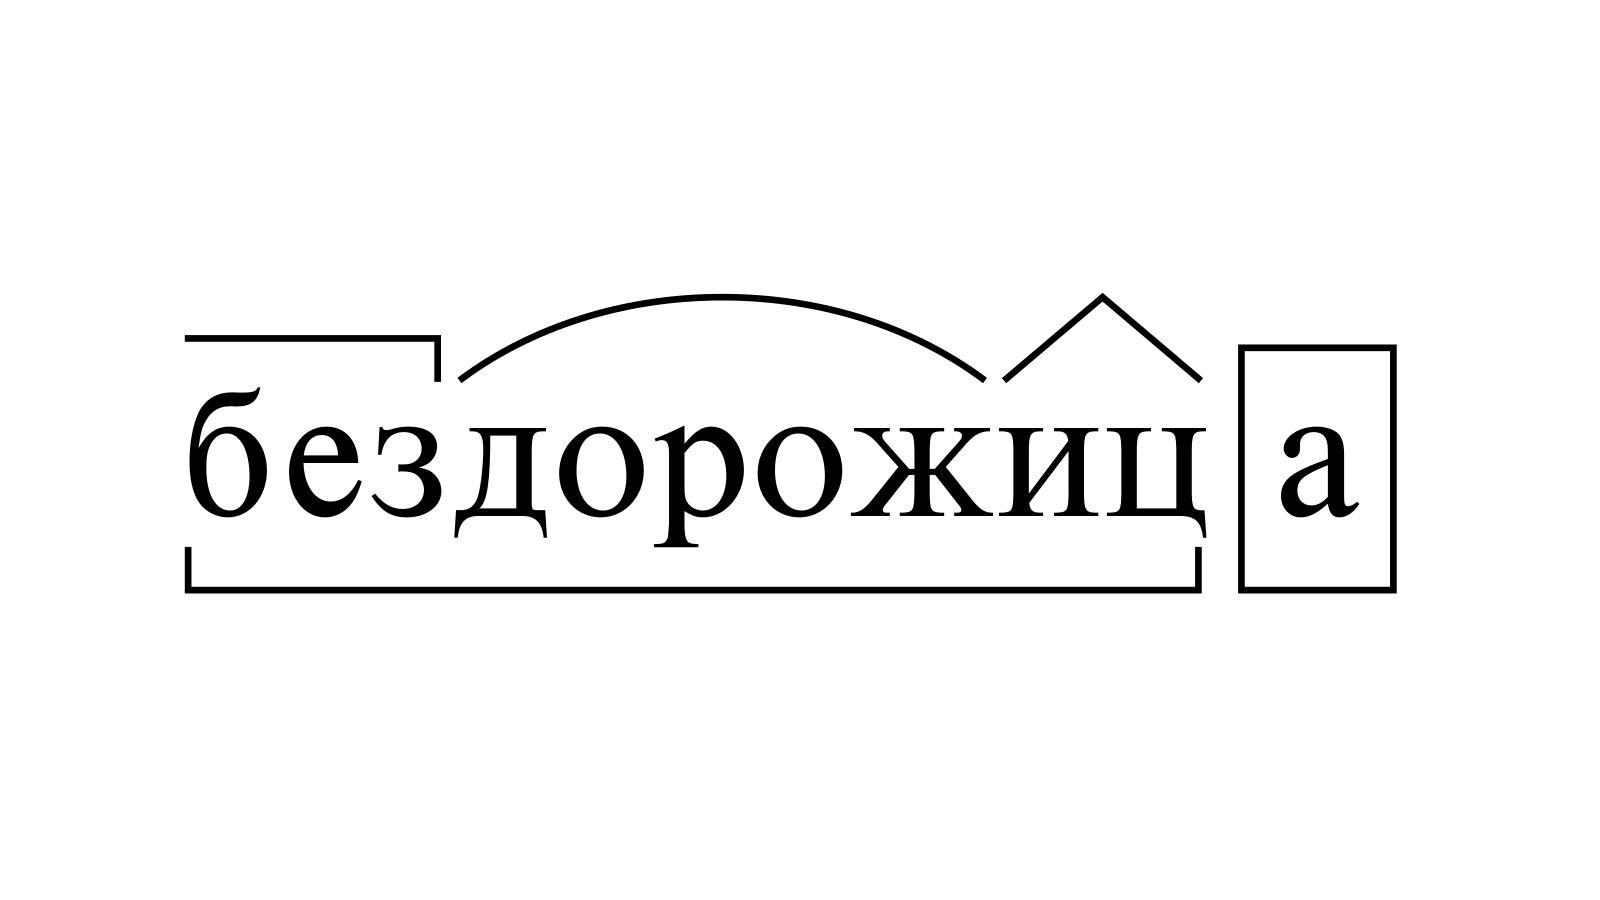 Разбор слова «бездорожица» по составу